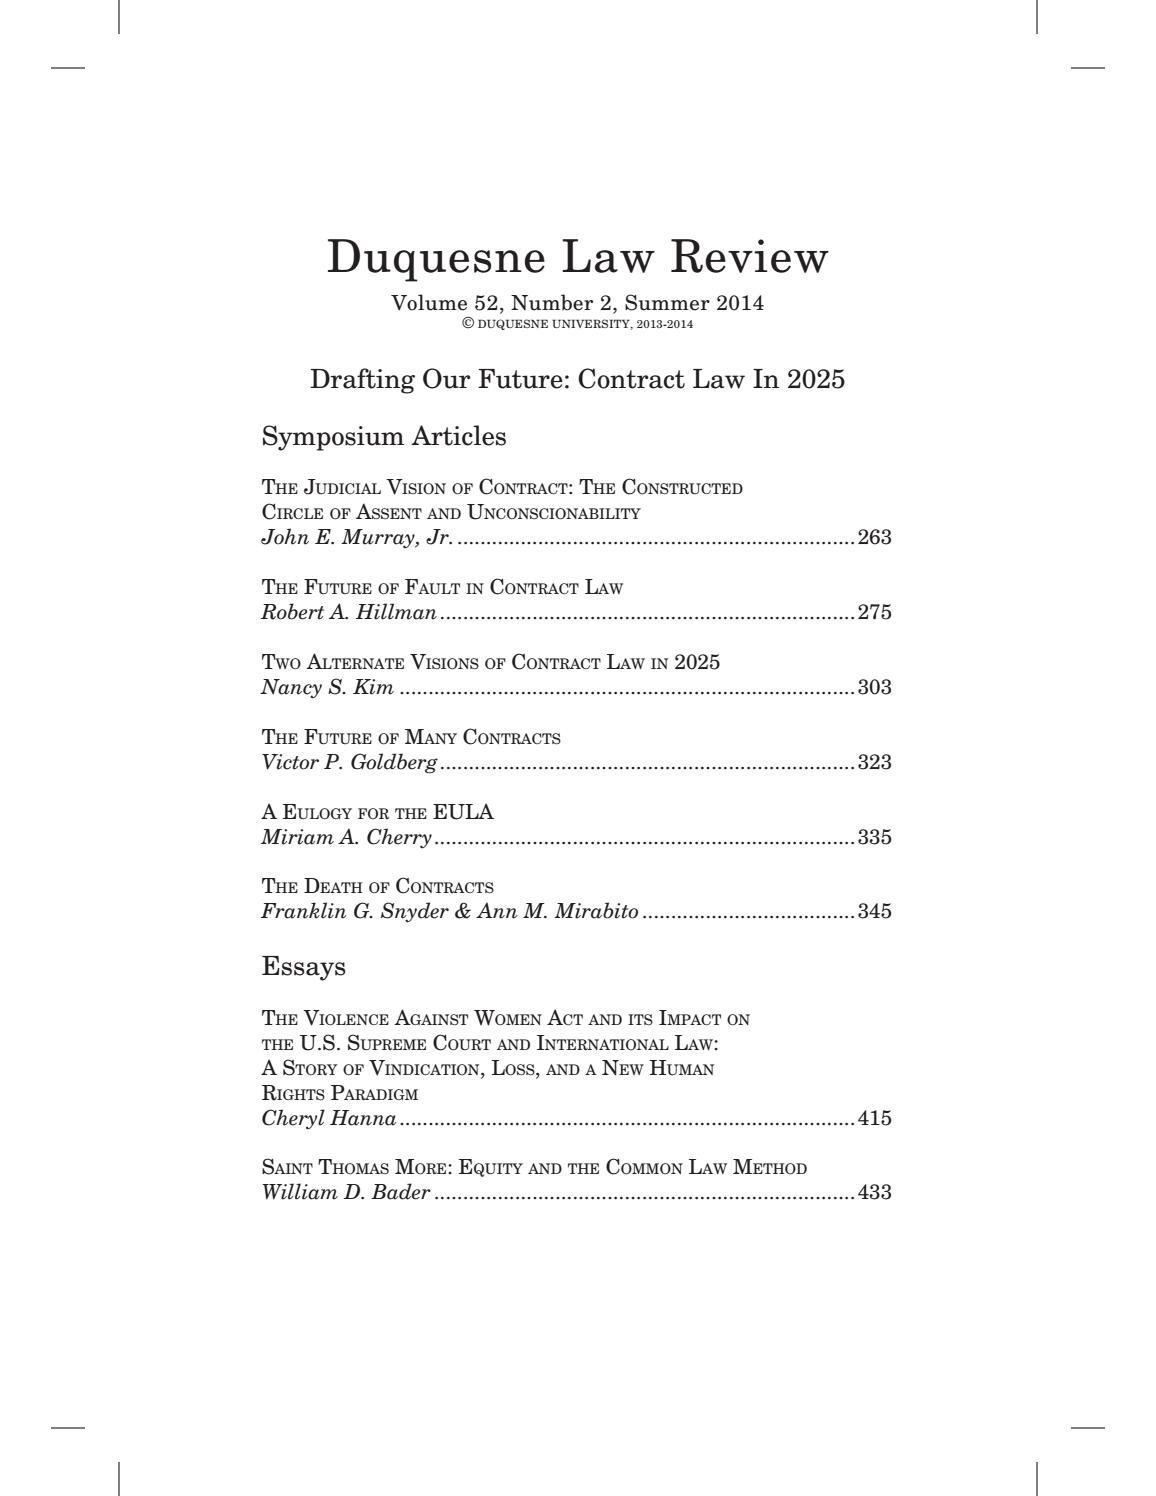 Duquesne Law Review Volume 52 2 by Duquesne University